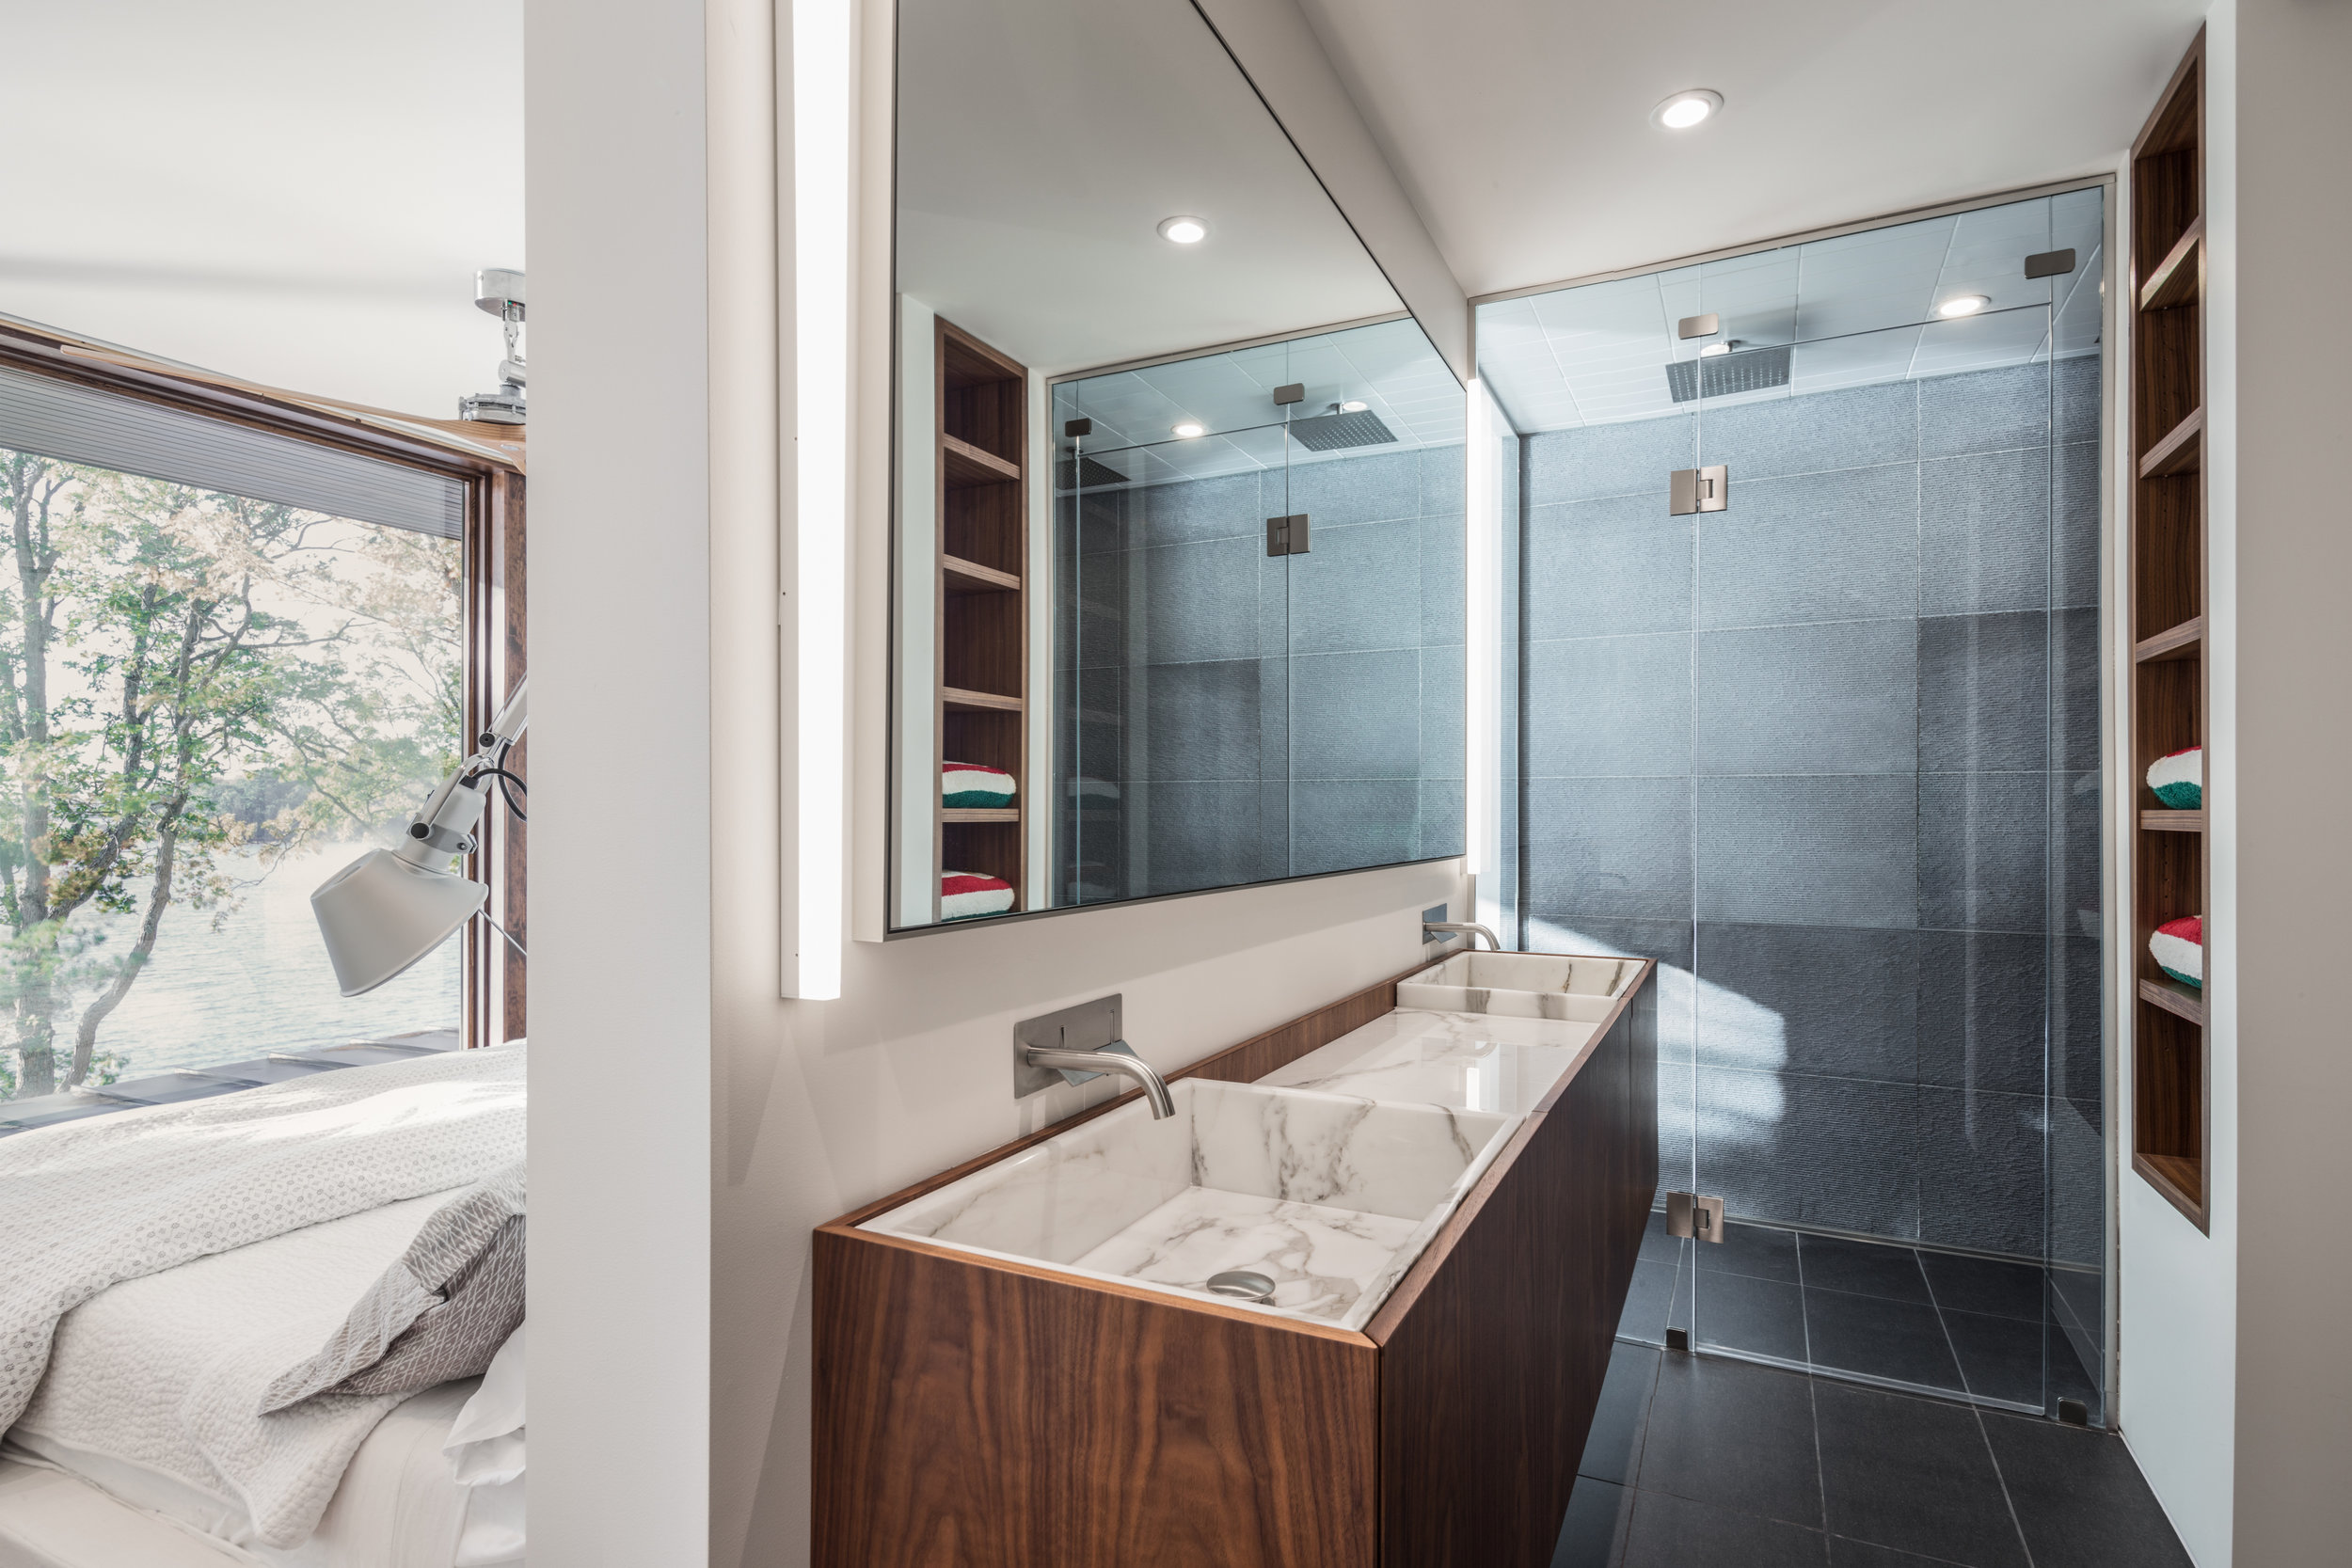 turkel_design_modern_prefab_home_bathroom.jpg